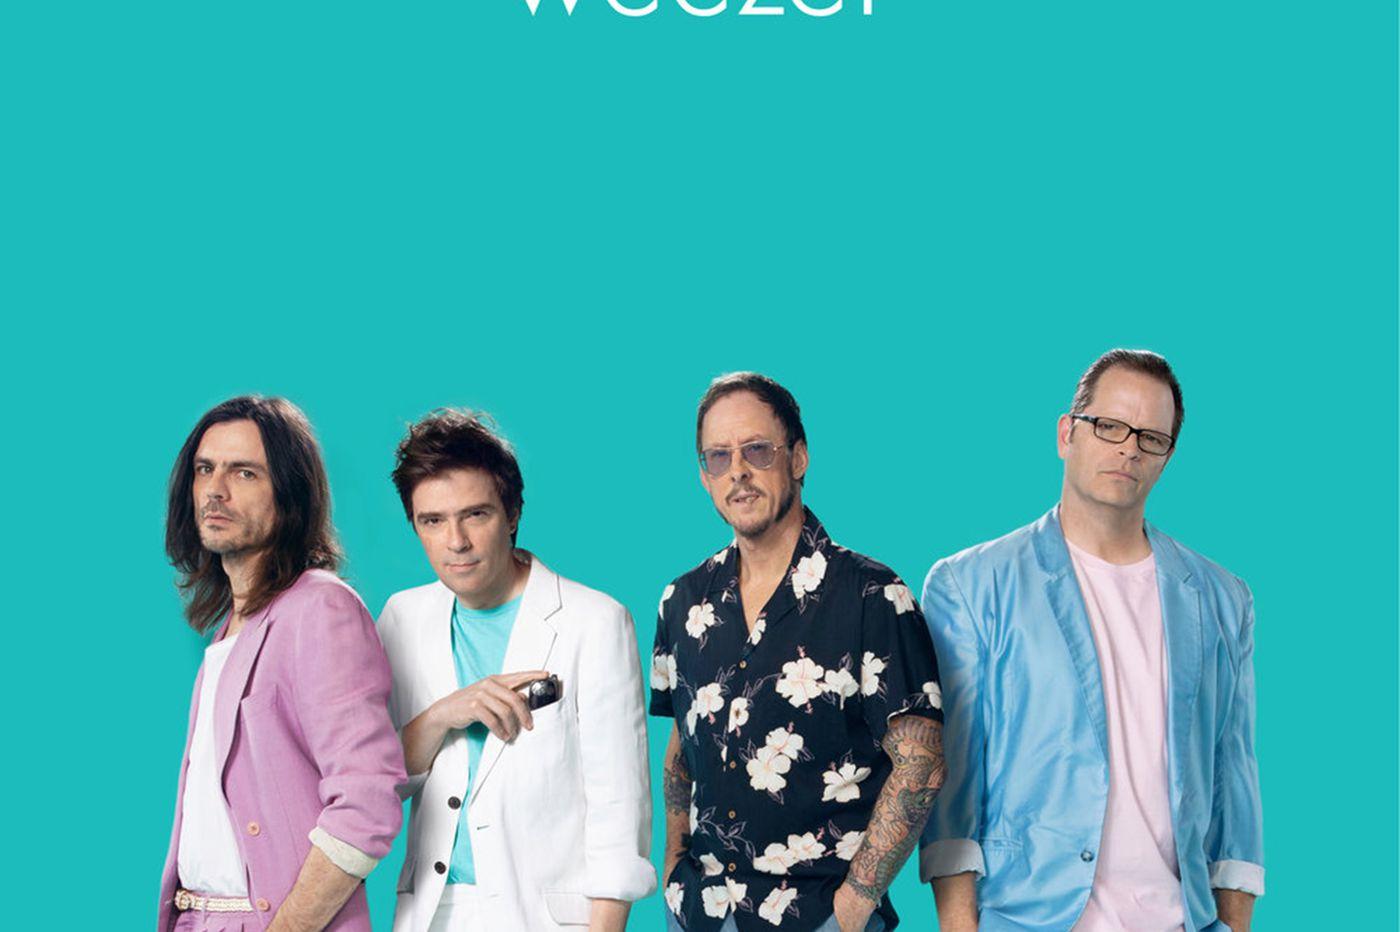 Album reviews: Weezer covers TLC, Sharon Van Etten and Ted Drozdowski